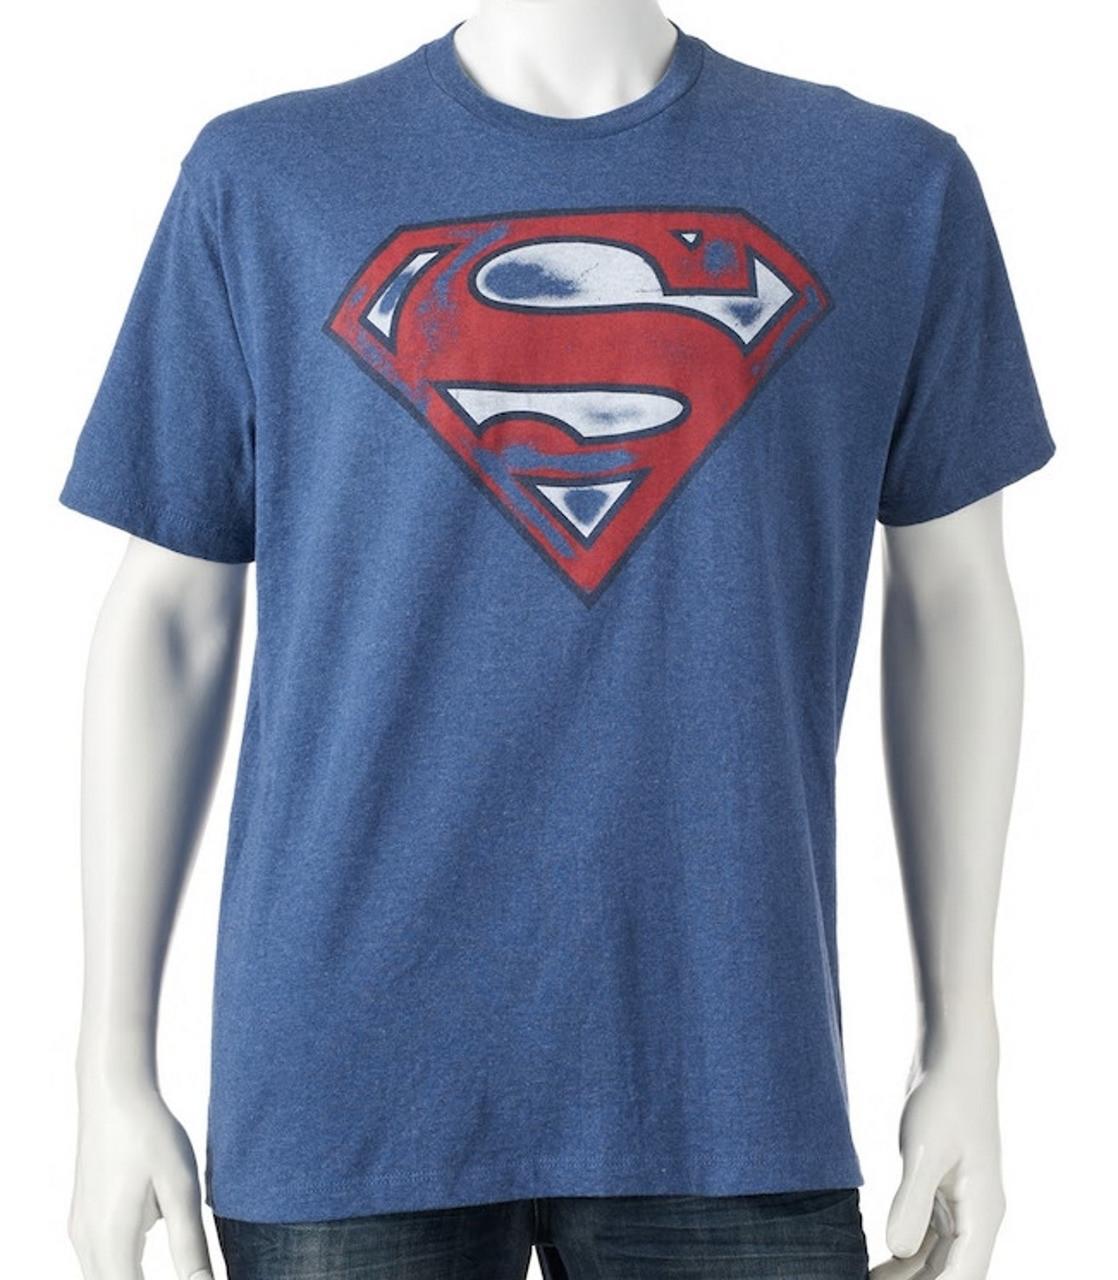 Men s DC Comics Superman Shield T-Shirt - Black Mountain Supply 54d9d52ef4